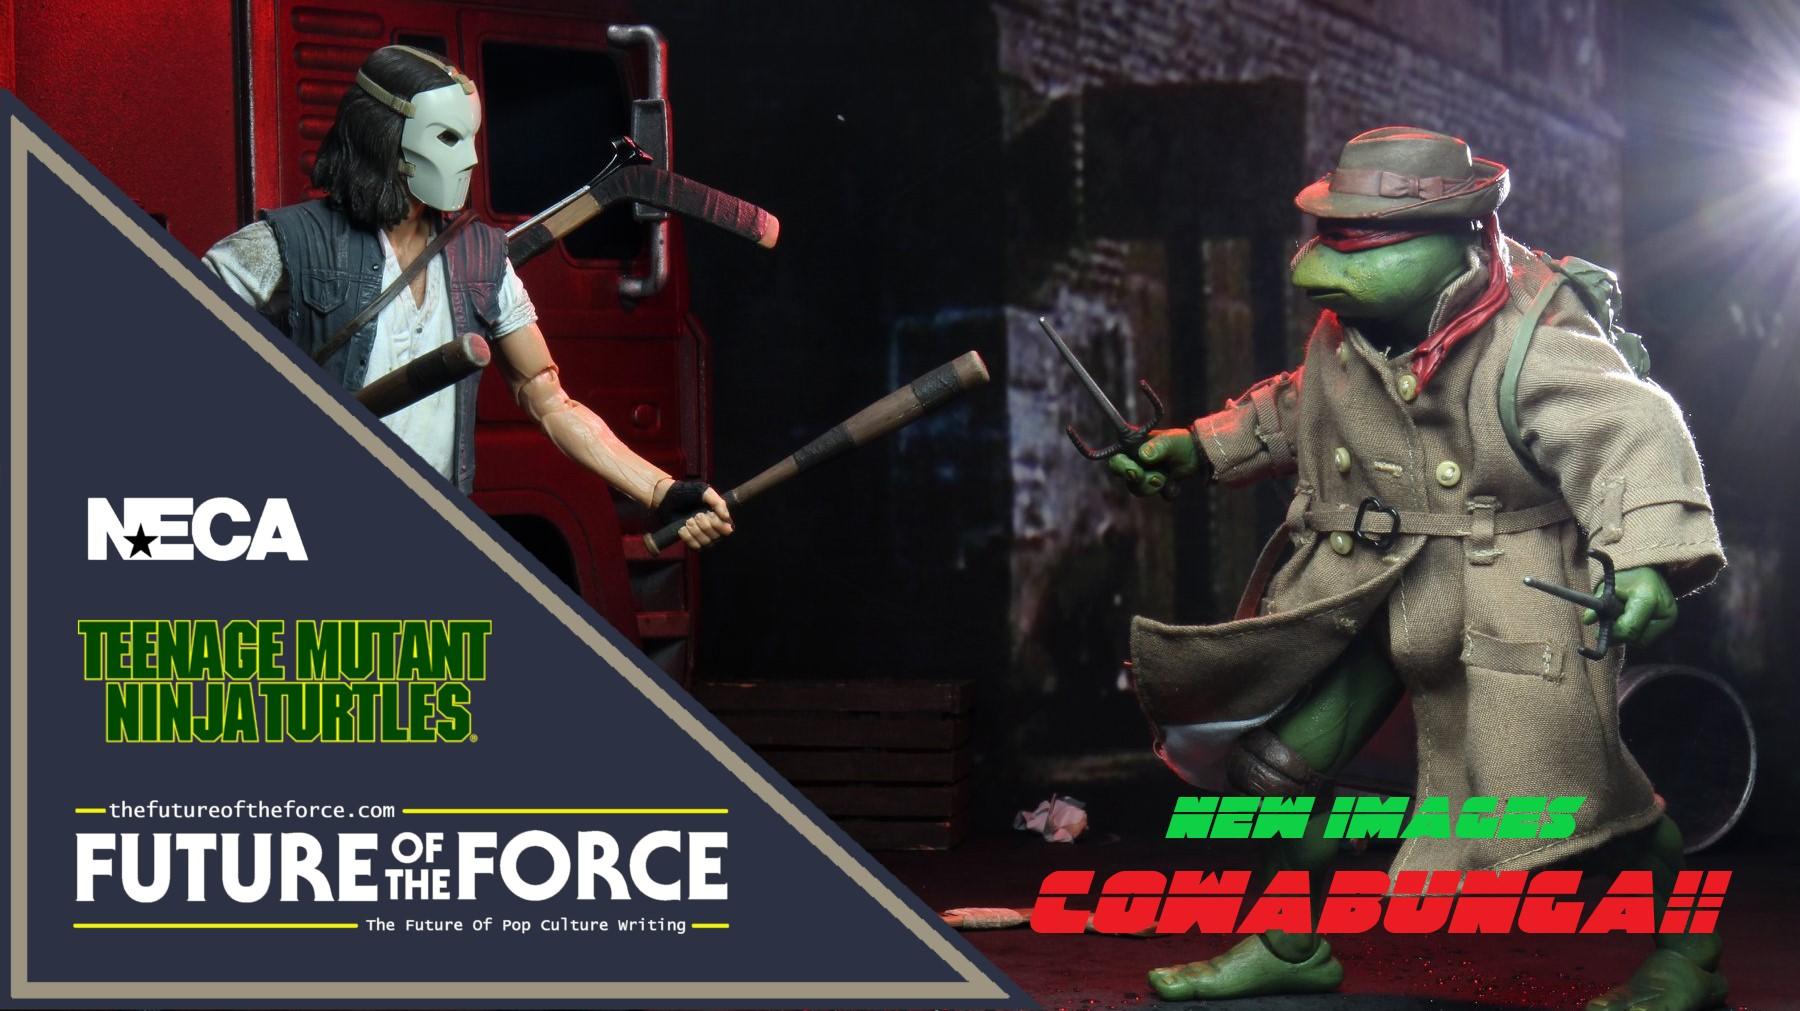 New Images | Casey Jones And Raphael (Trench Coat) Teenage Mutant Ninja Turtles (1990 Movie) NECA